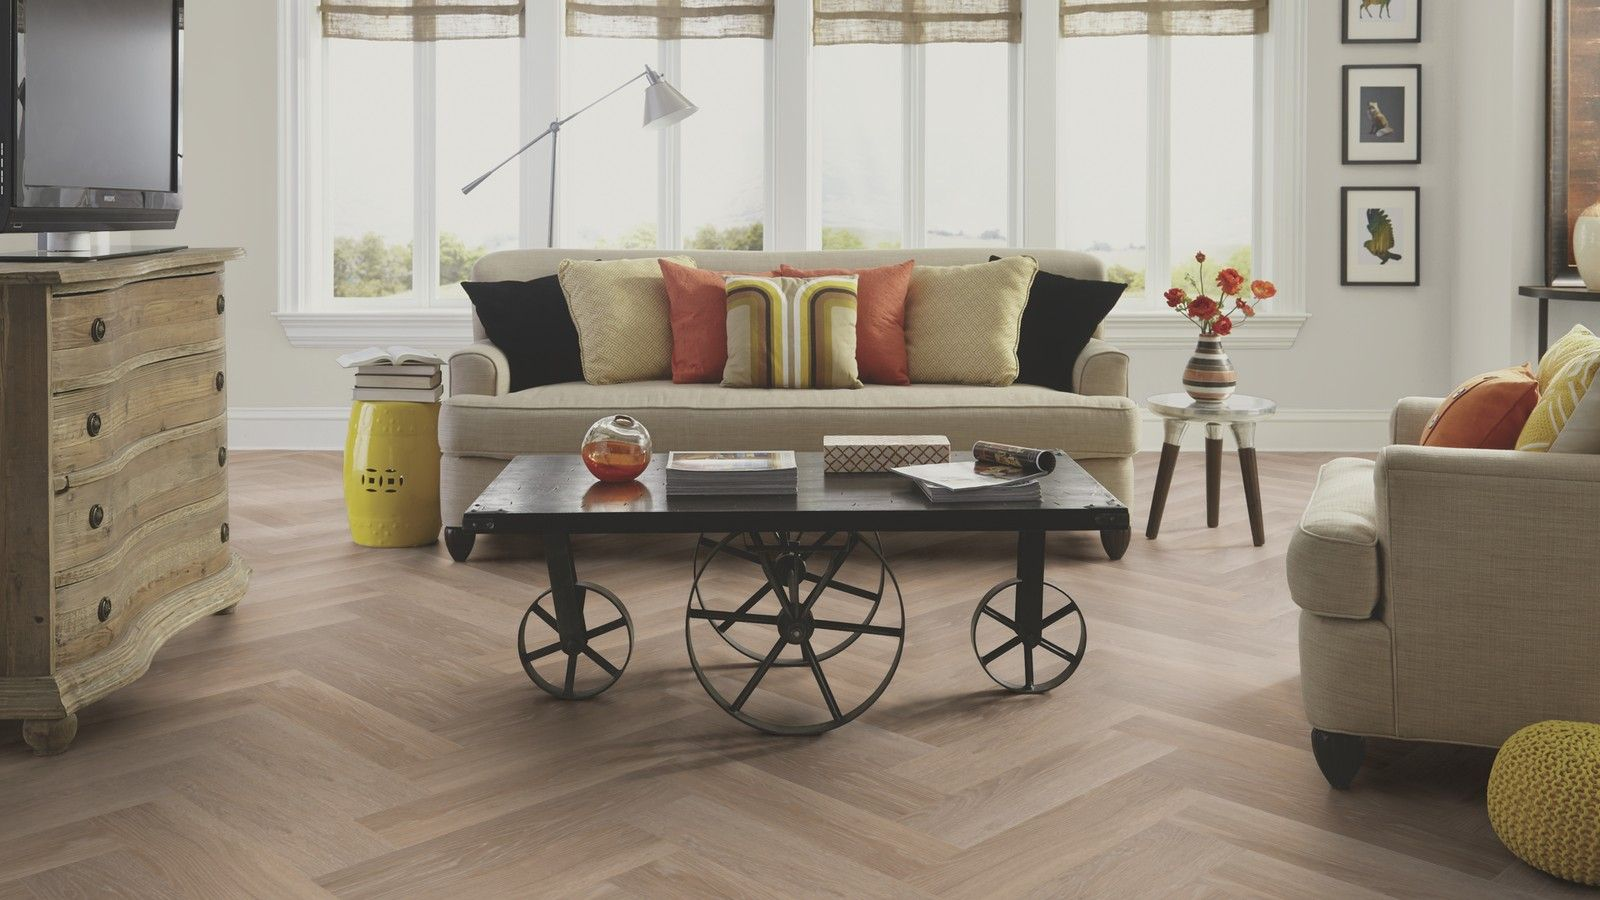 Visgraat pvc vloeren goedkoop en vakkundig! legservice en garantie